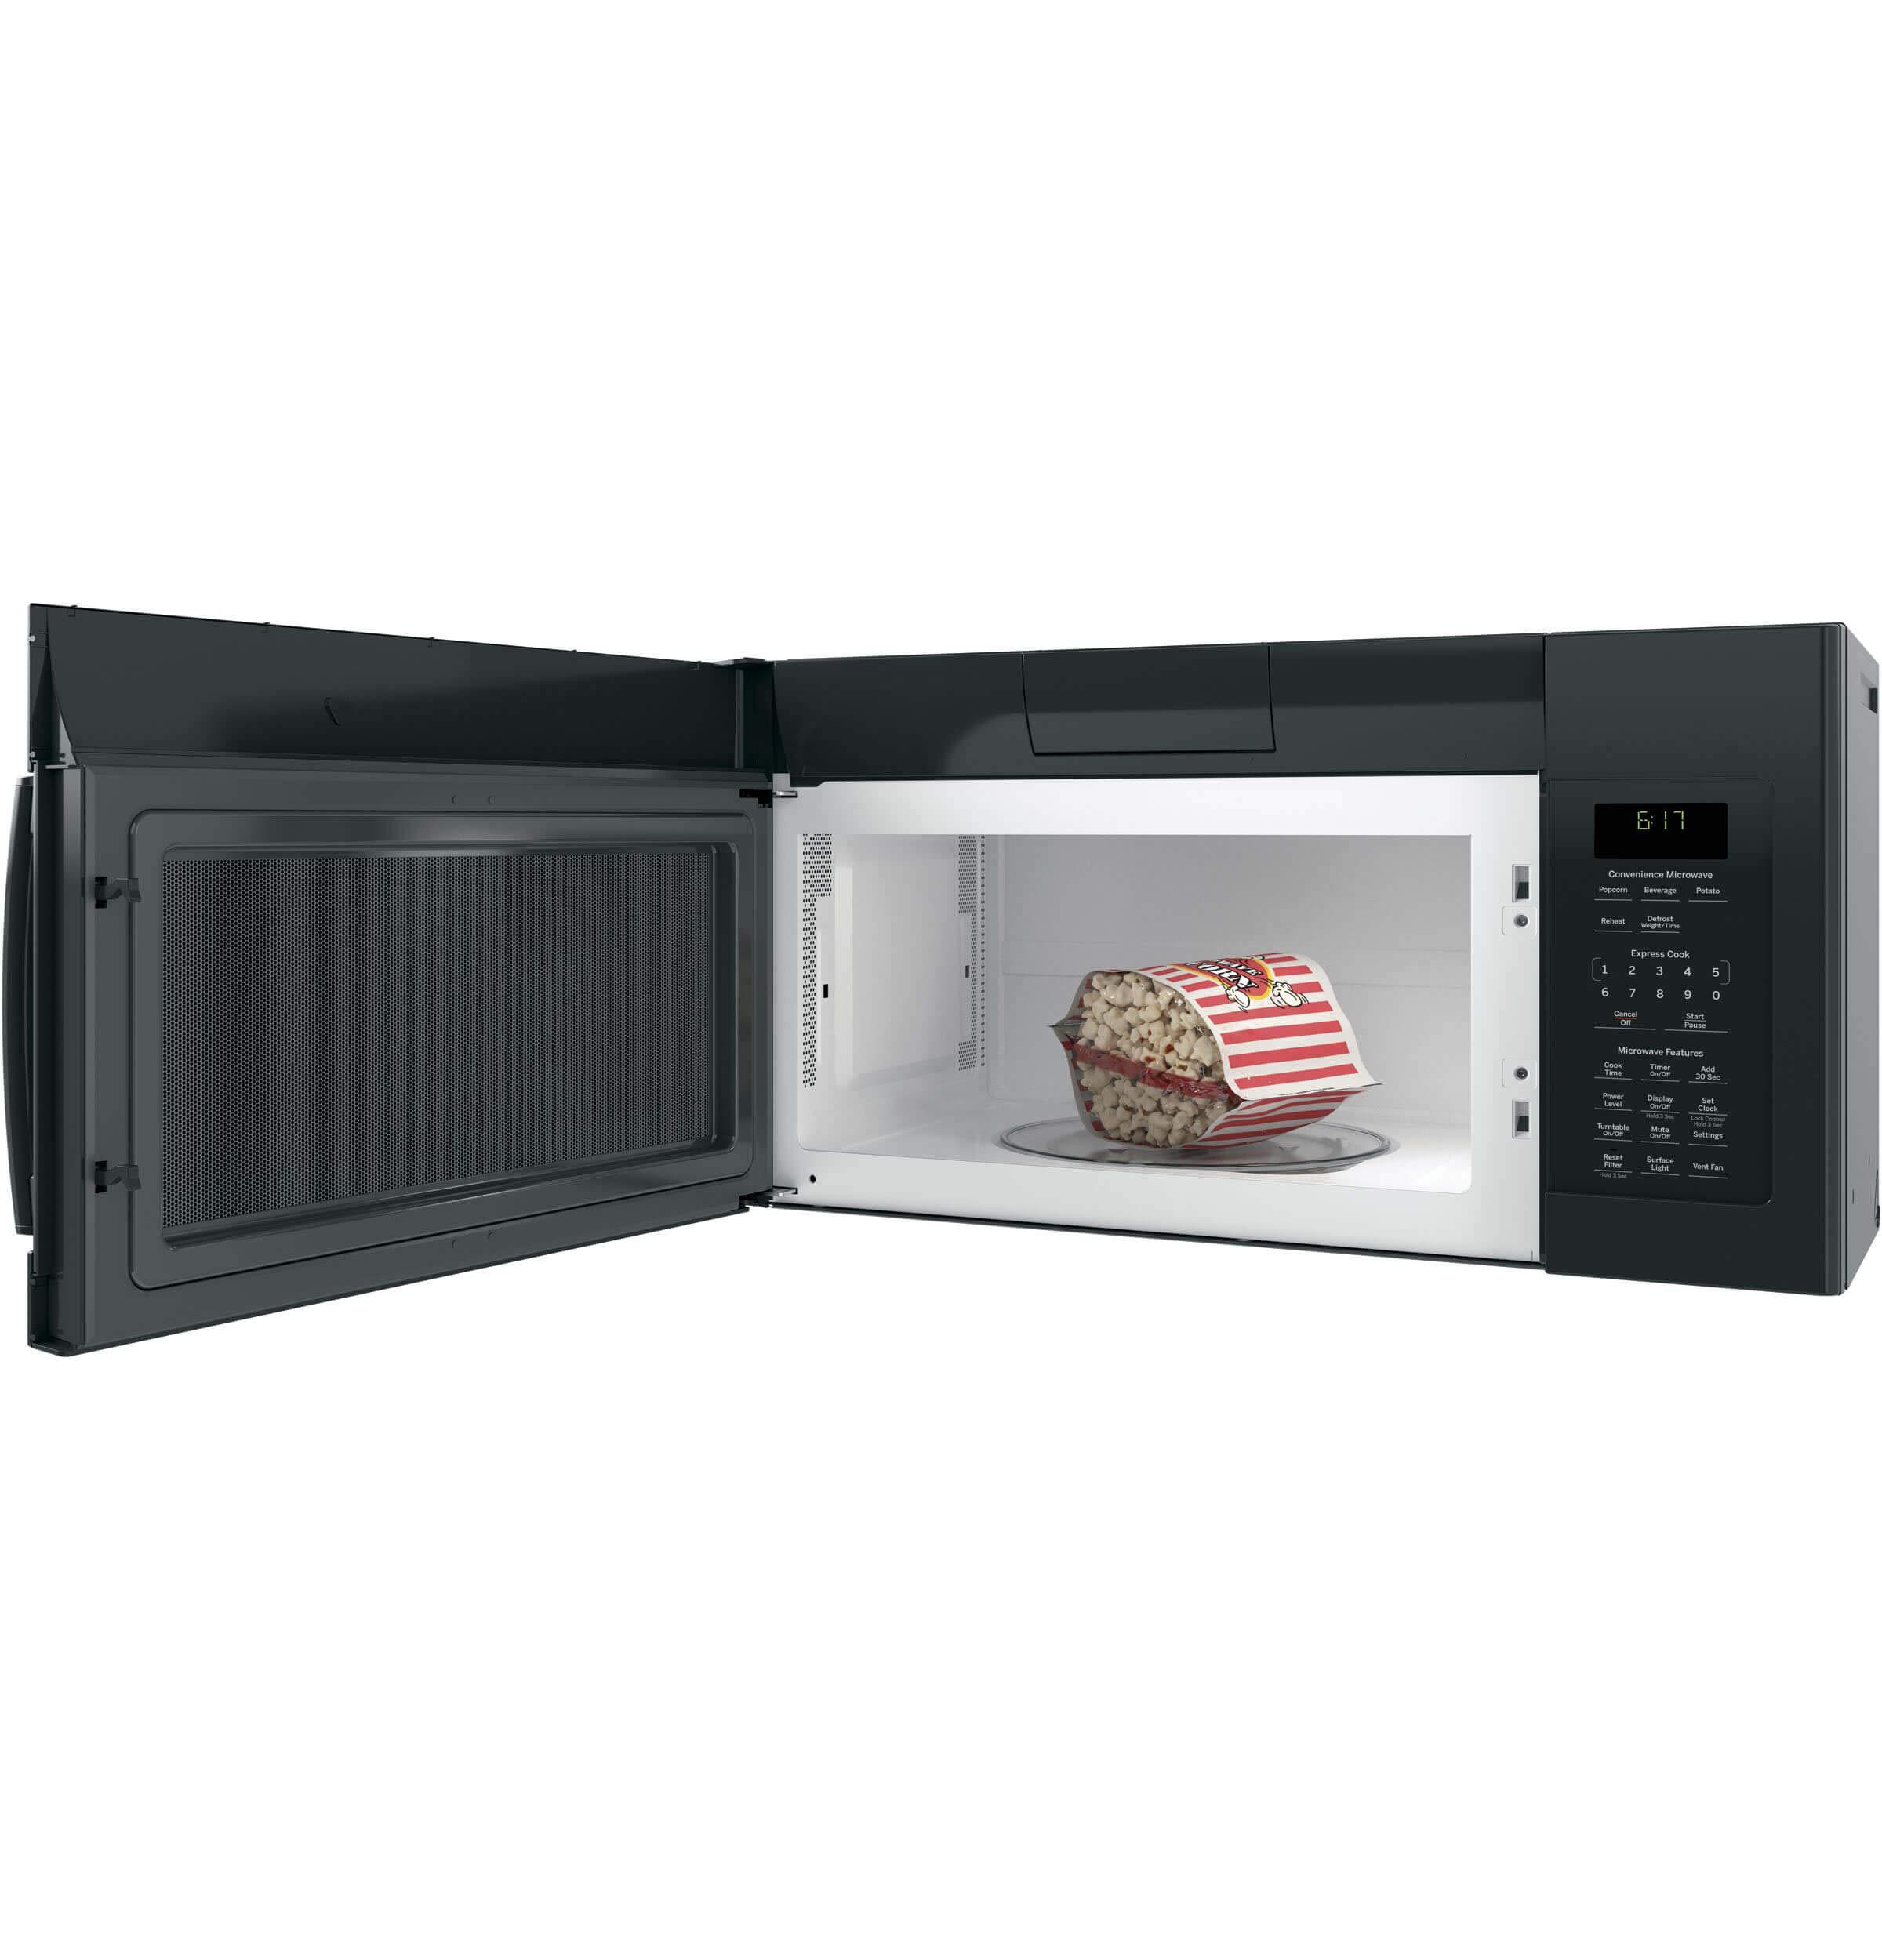 GE JVM6172DKBB Over-the- Over-the-Range Microwave, 1.7, Black by GE (Image #8)